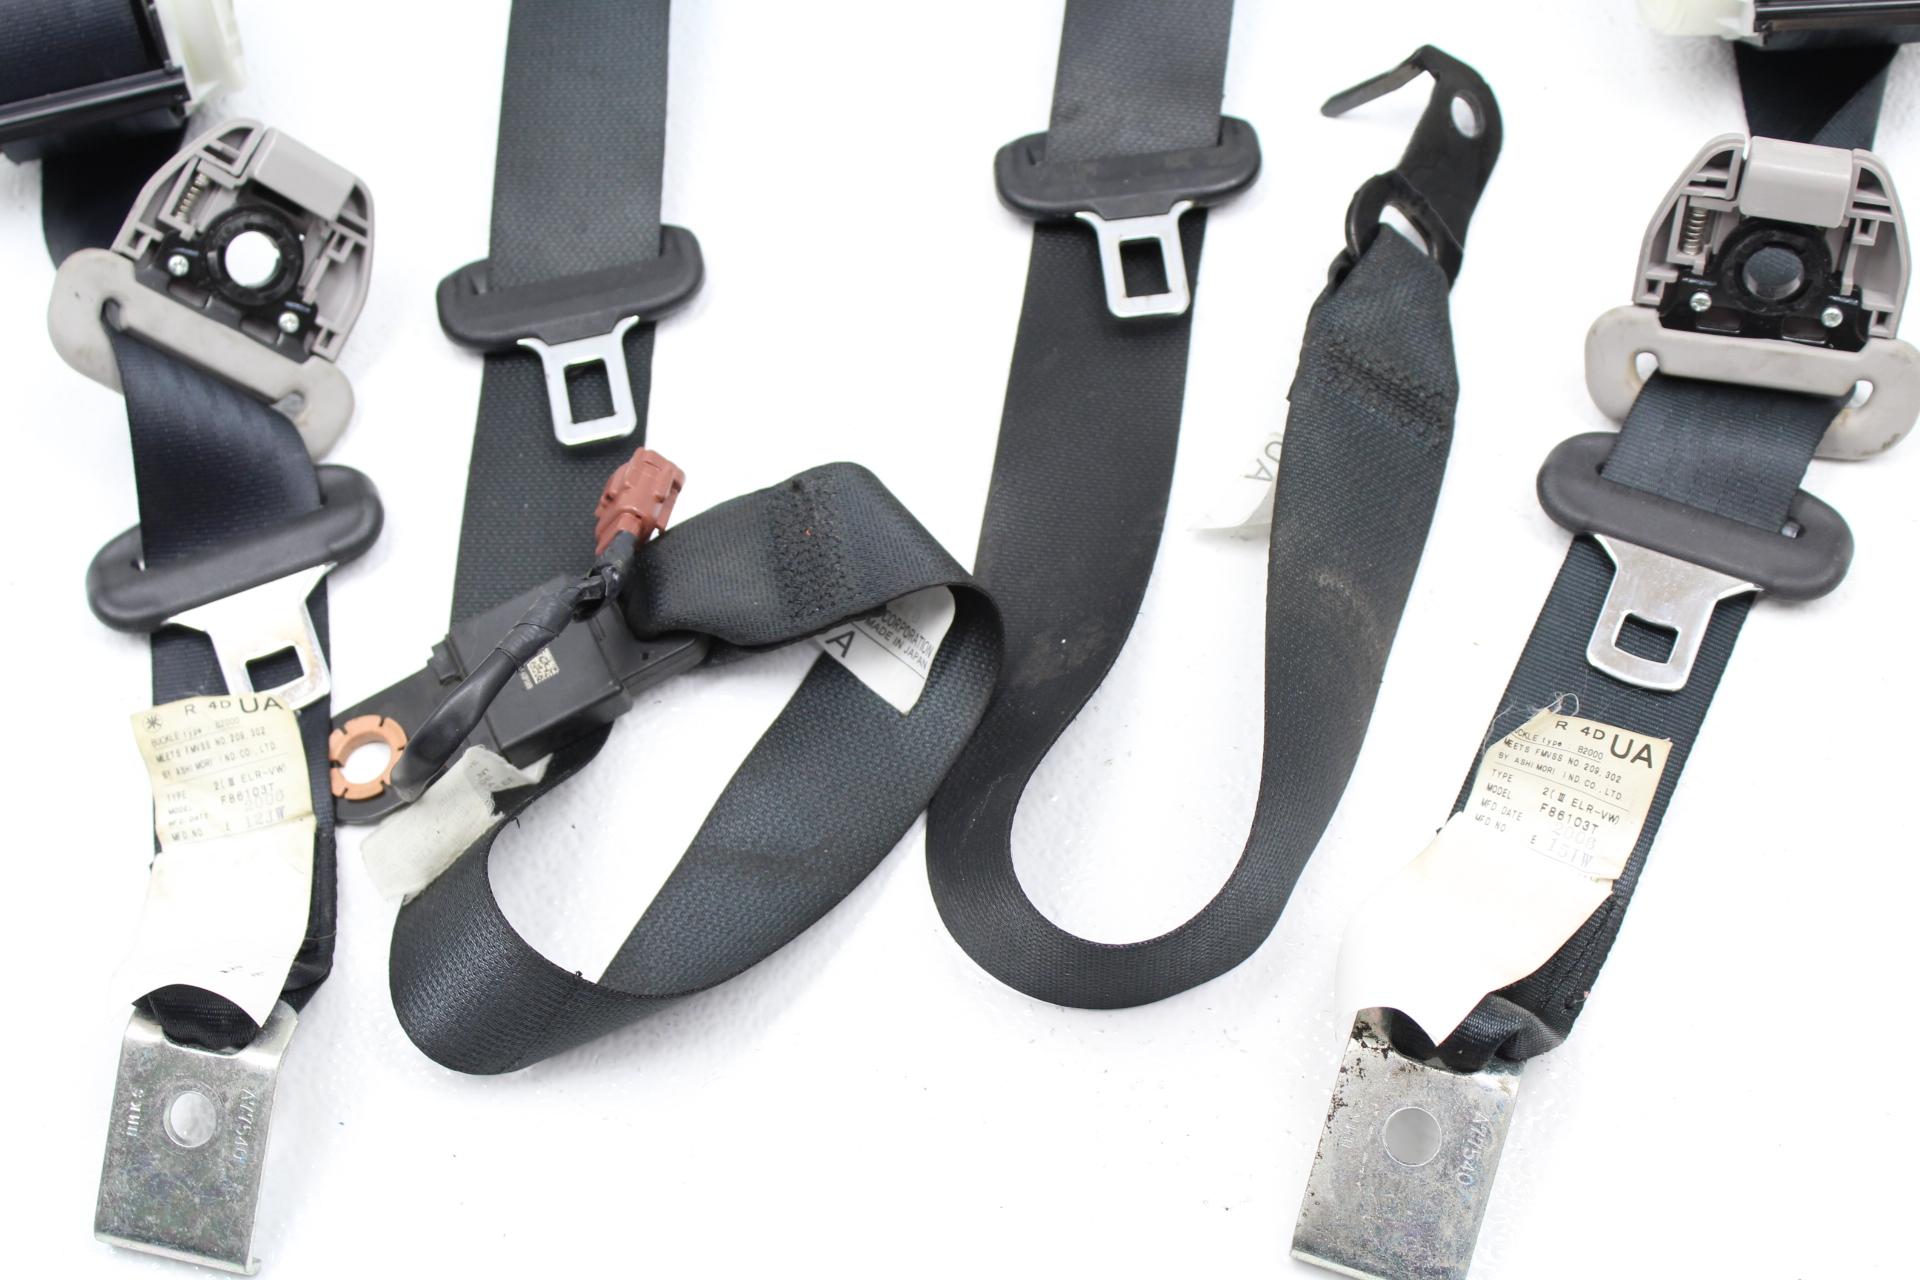 Rear Seat Belts Won T Auto Lock For Car Seat